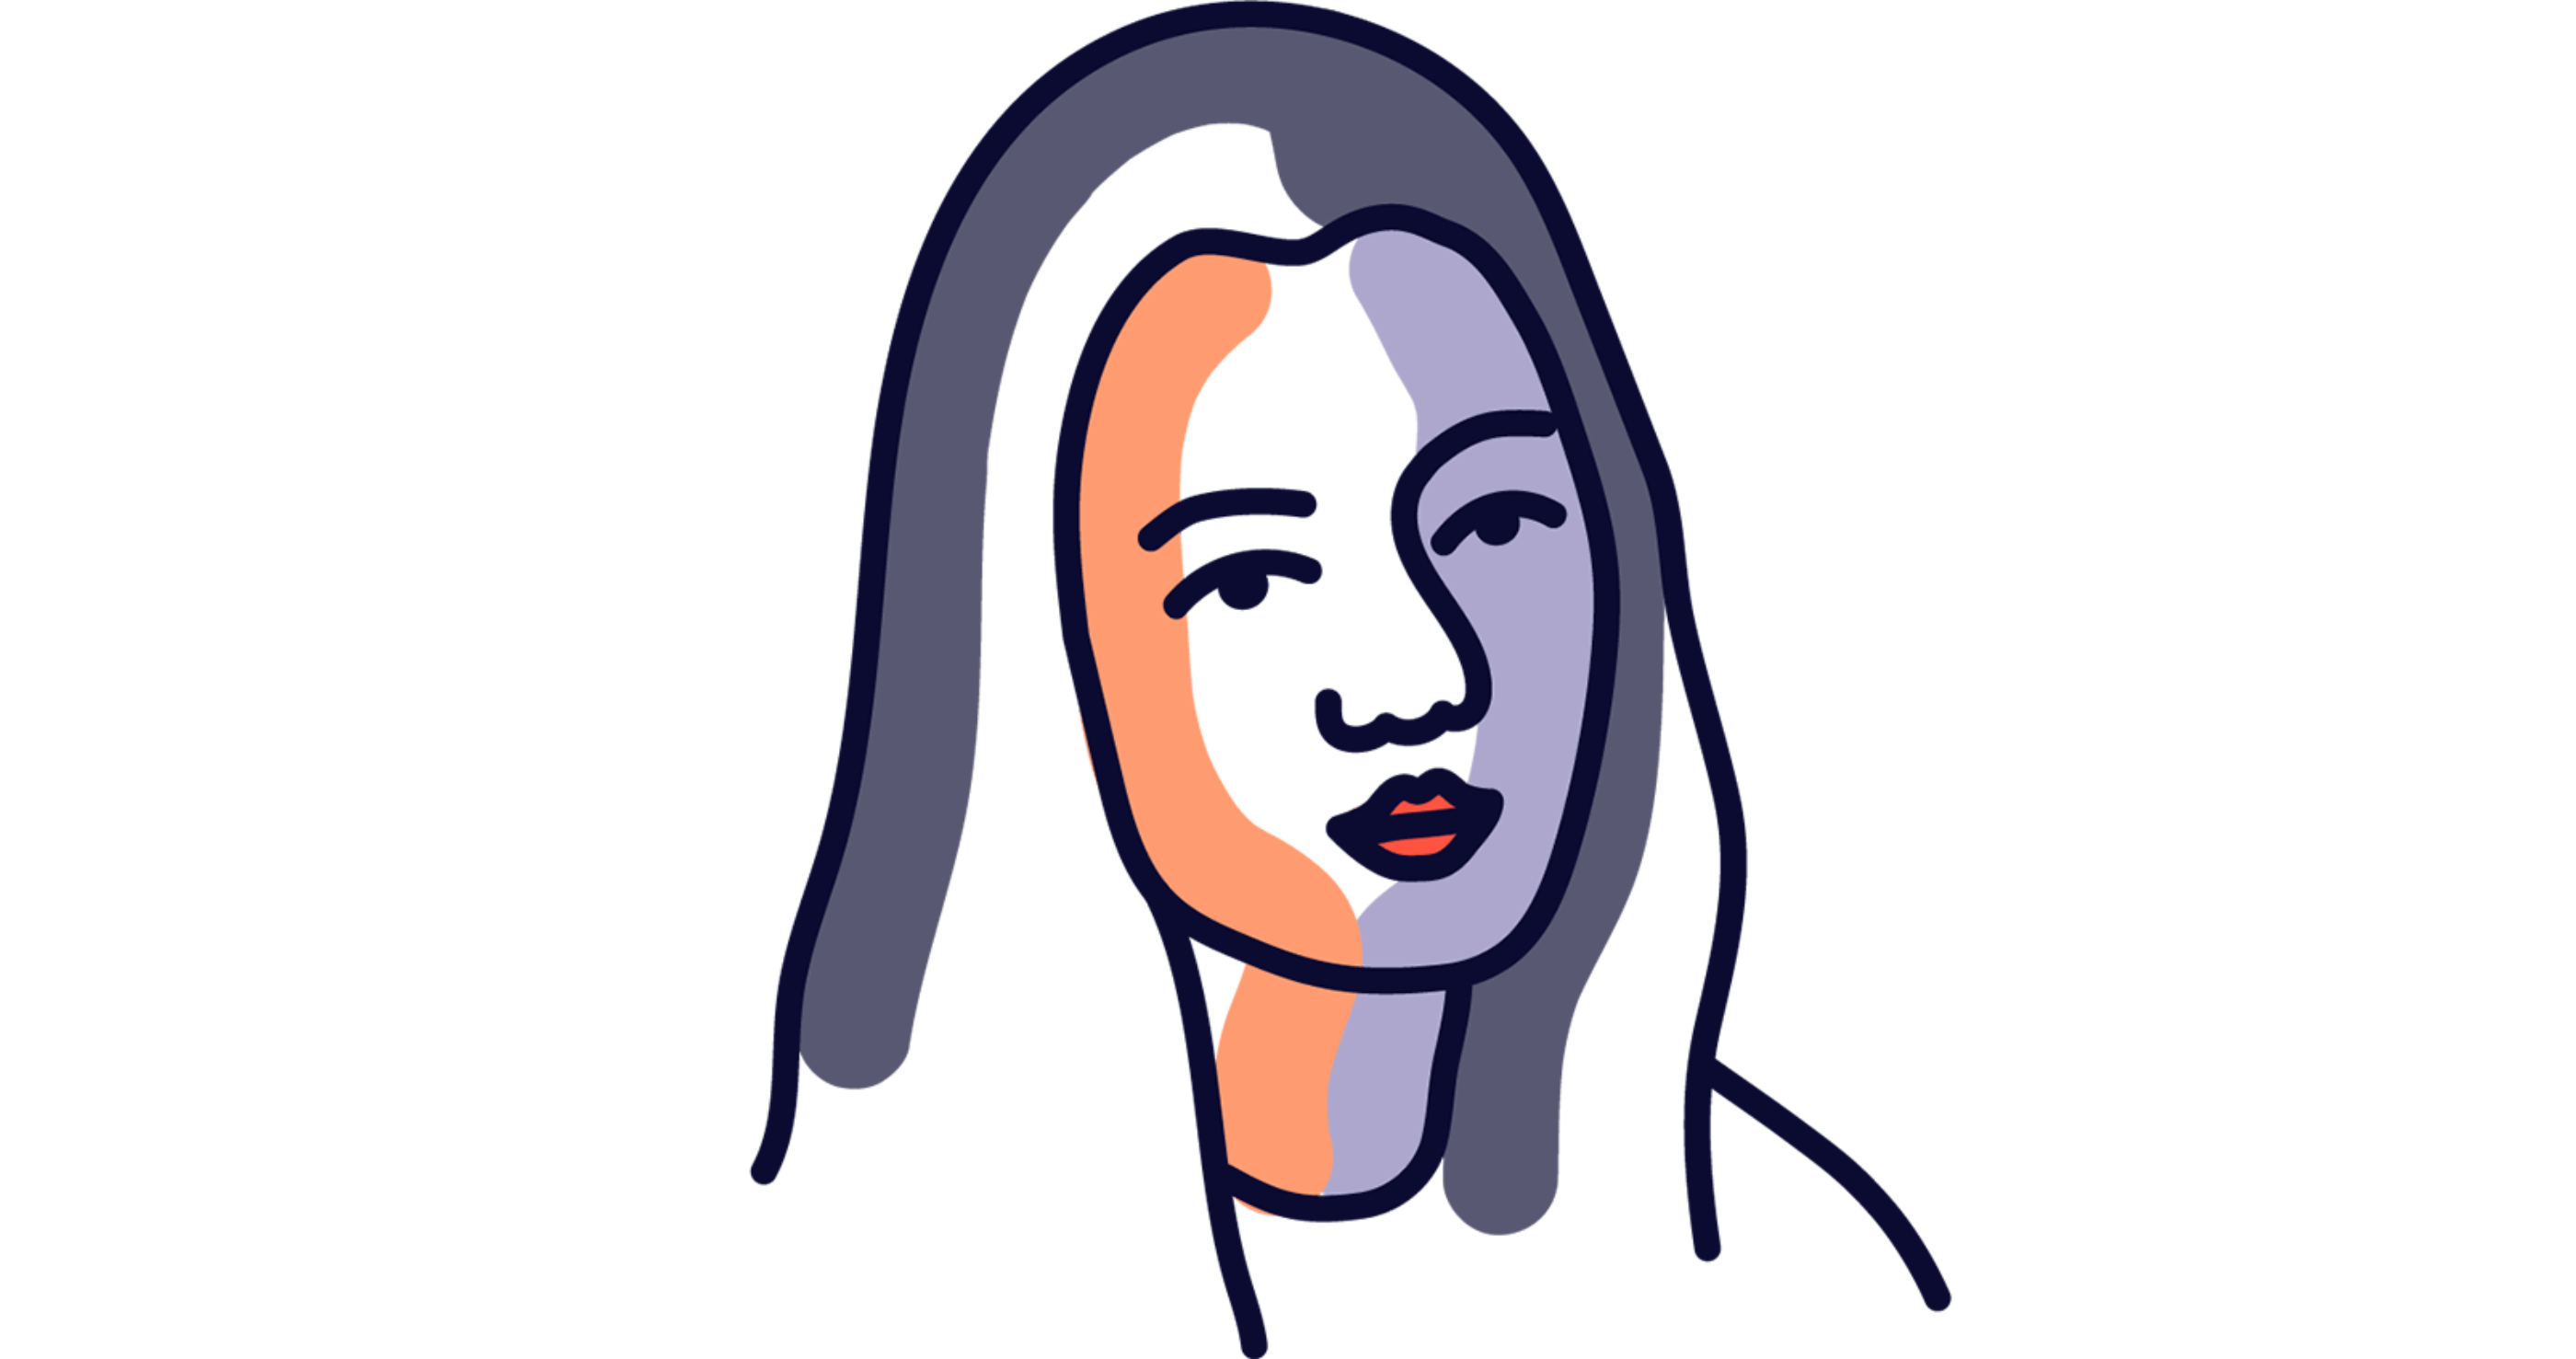 Illustration of Kahn, the writer